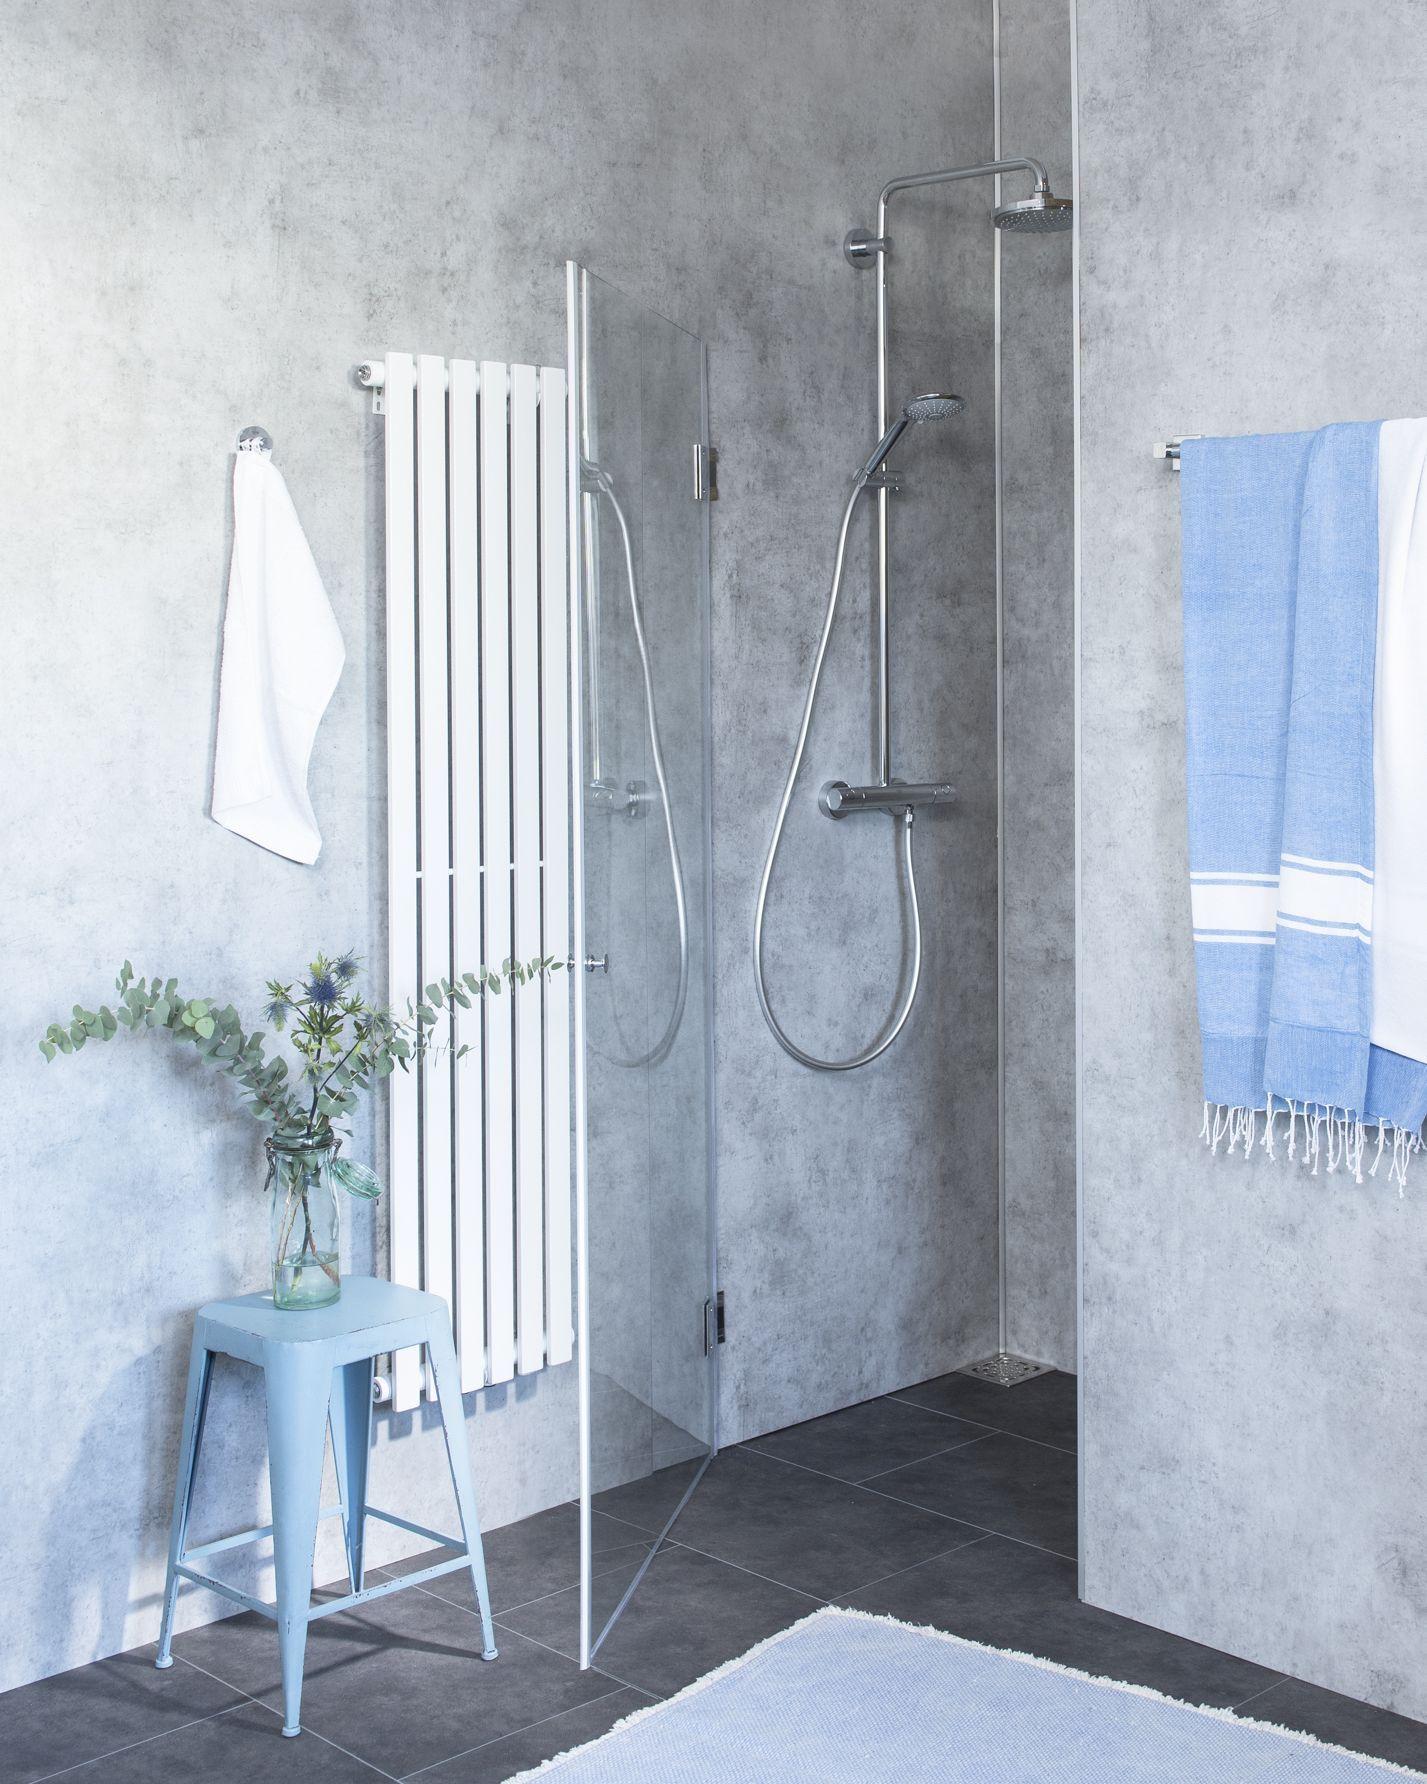 duschabtrennung f r nische klarglas chrom h 195cm combia b1n. Black Bedroom Furniture Sets. Home Design Ideas